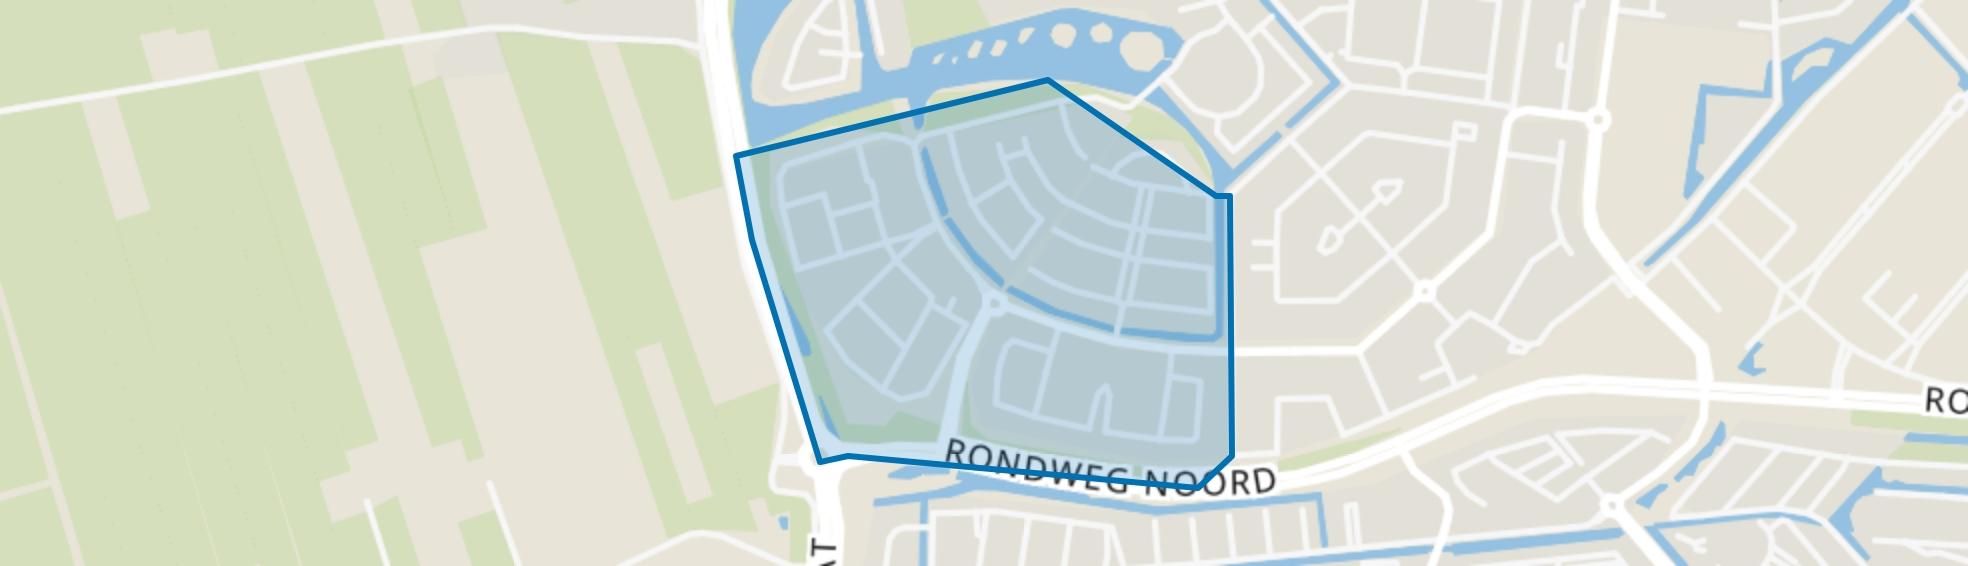 Hoge Hoven, Amersfoort map